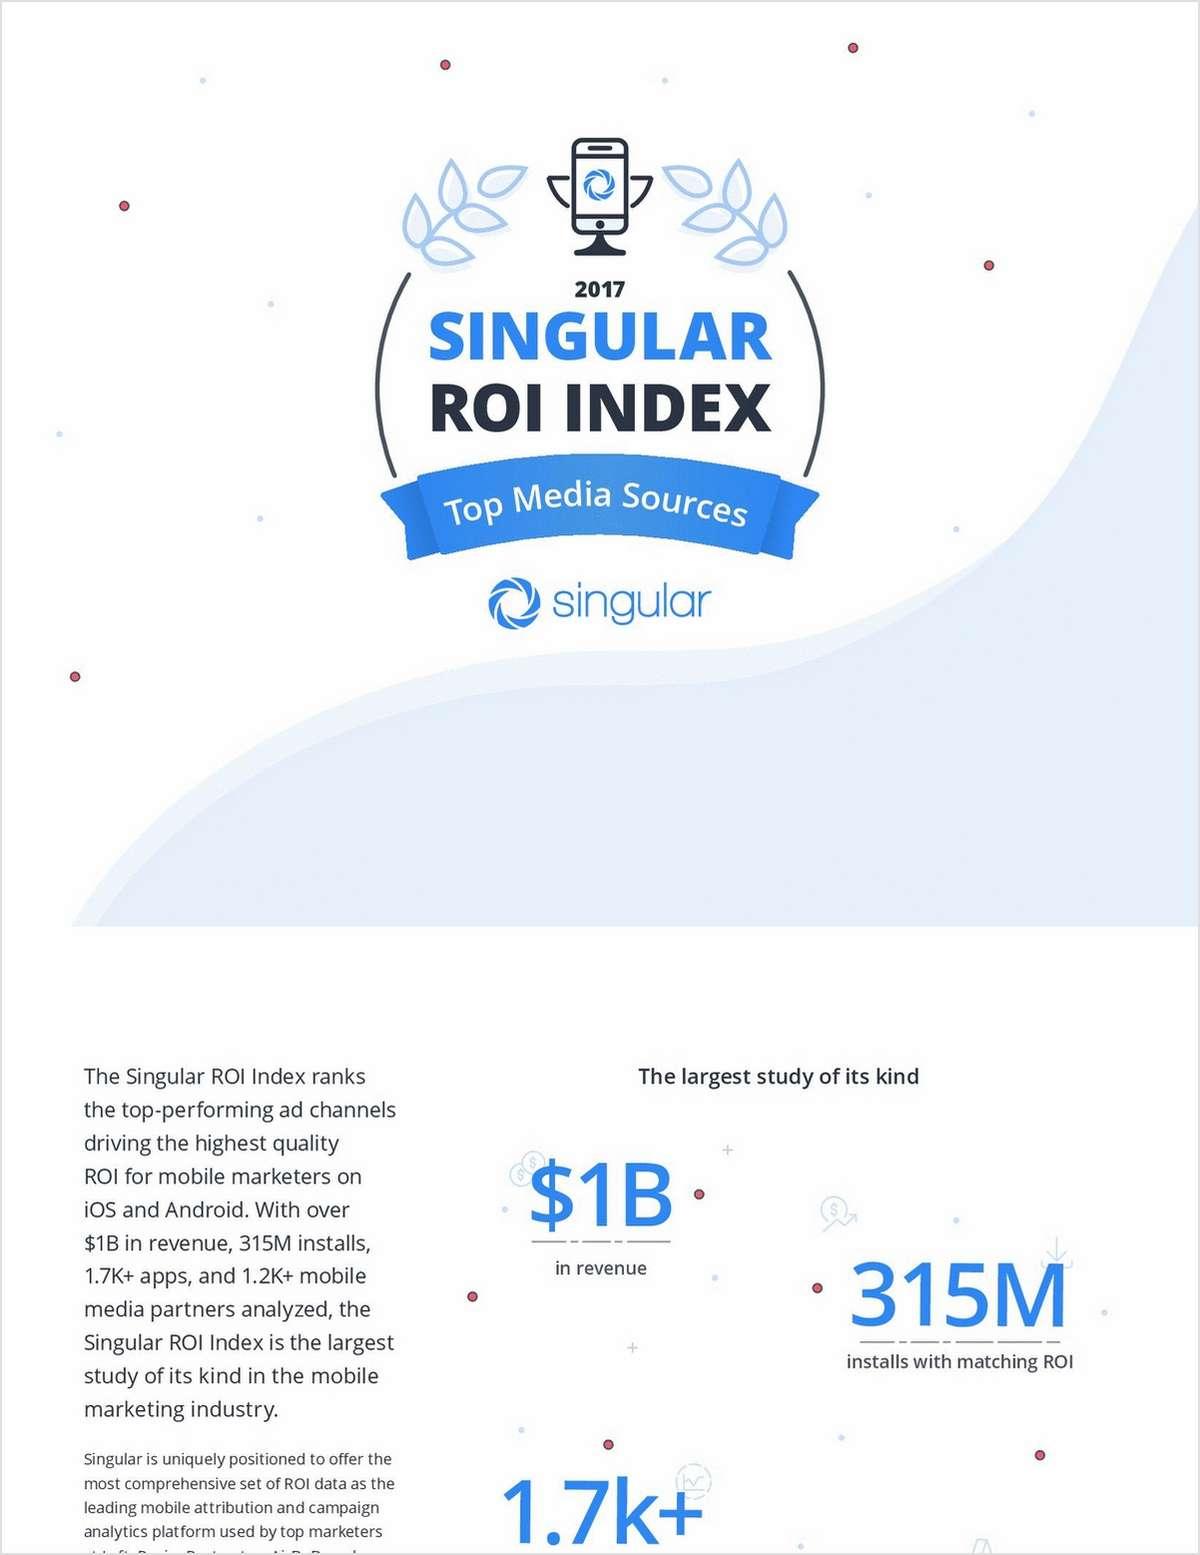 ROI Index: Top Mobile Media Sources